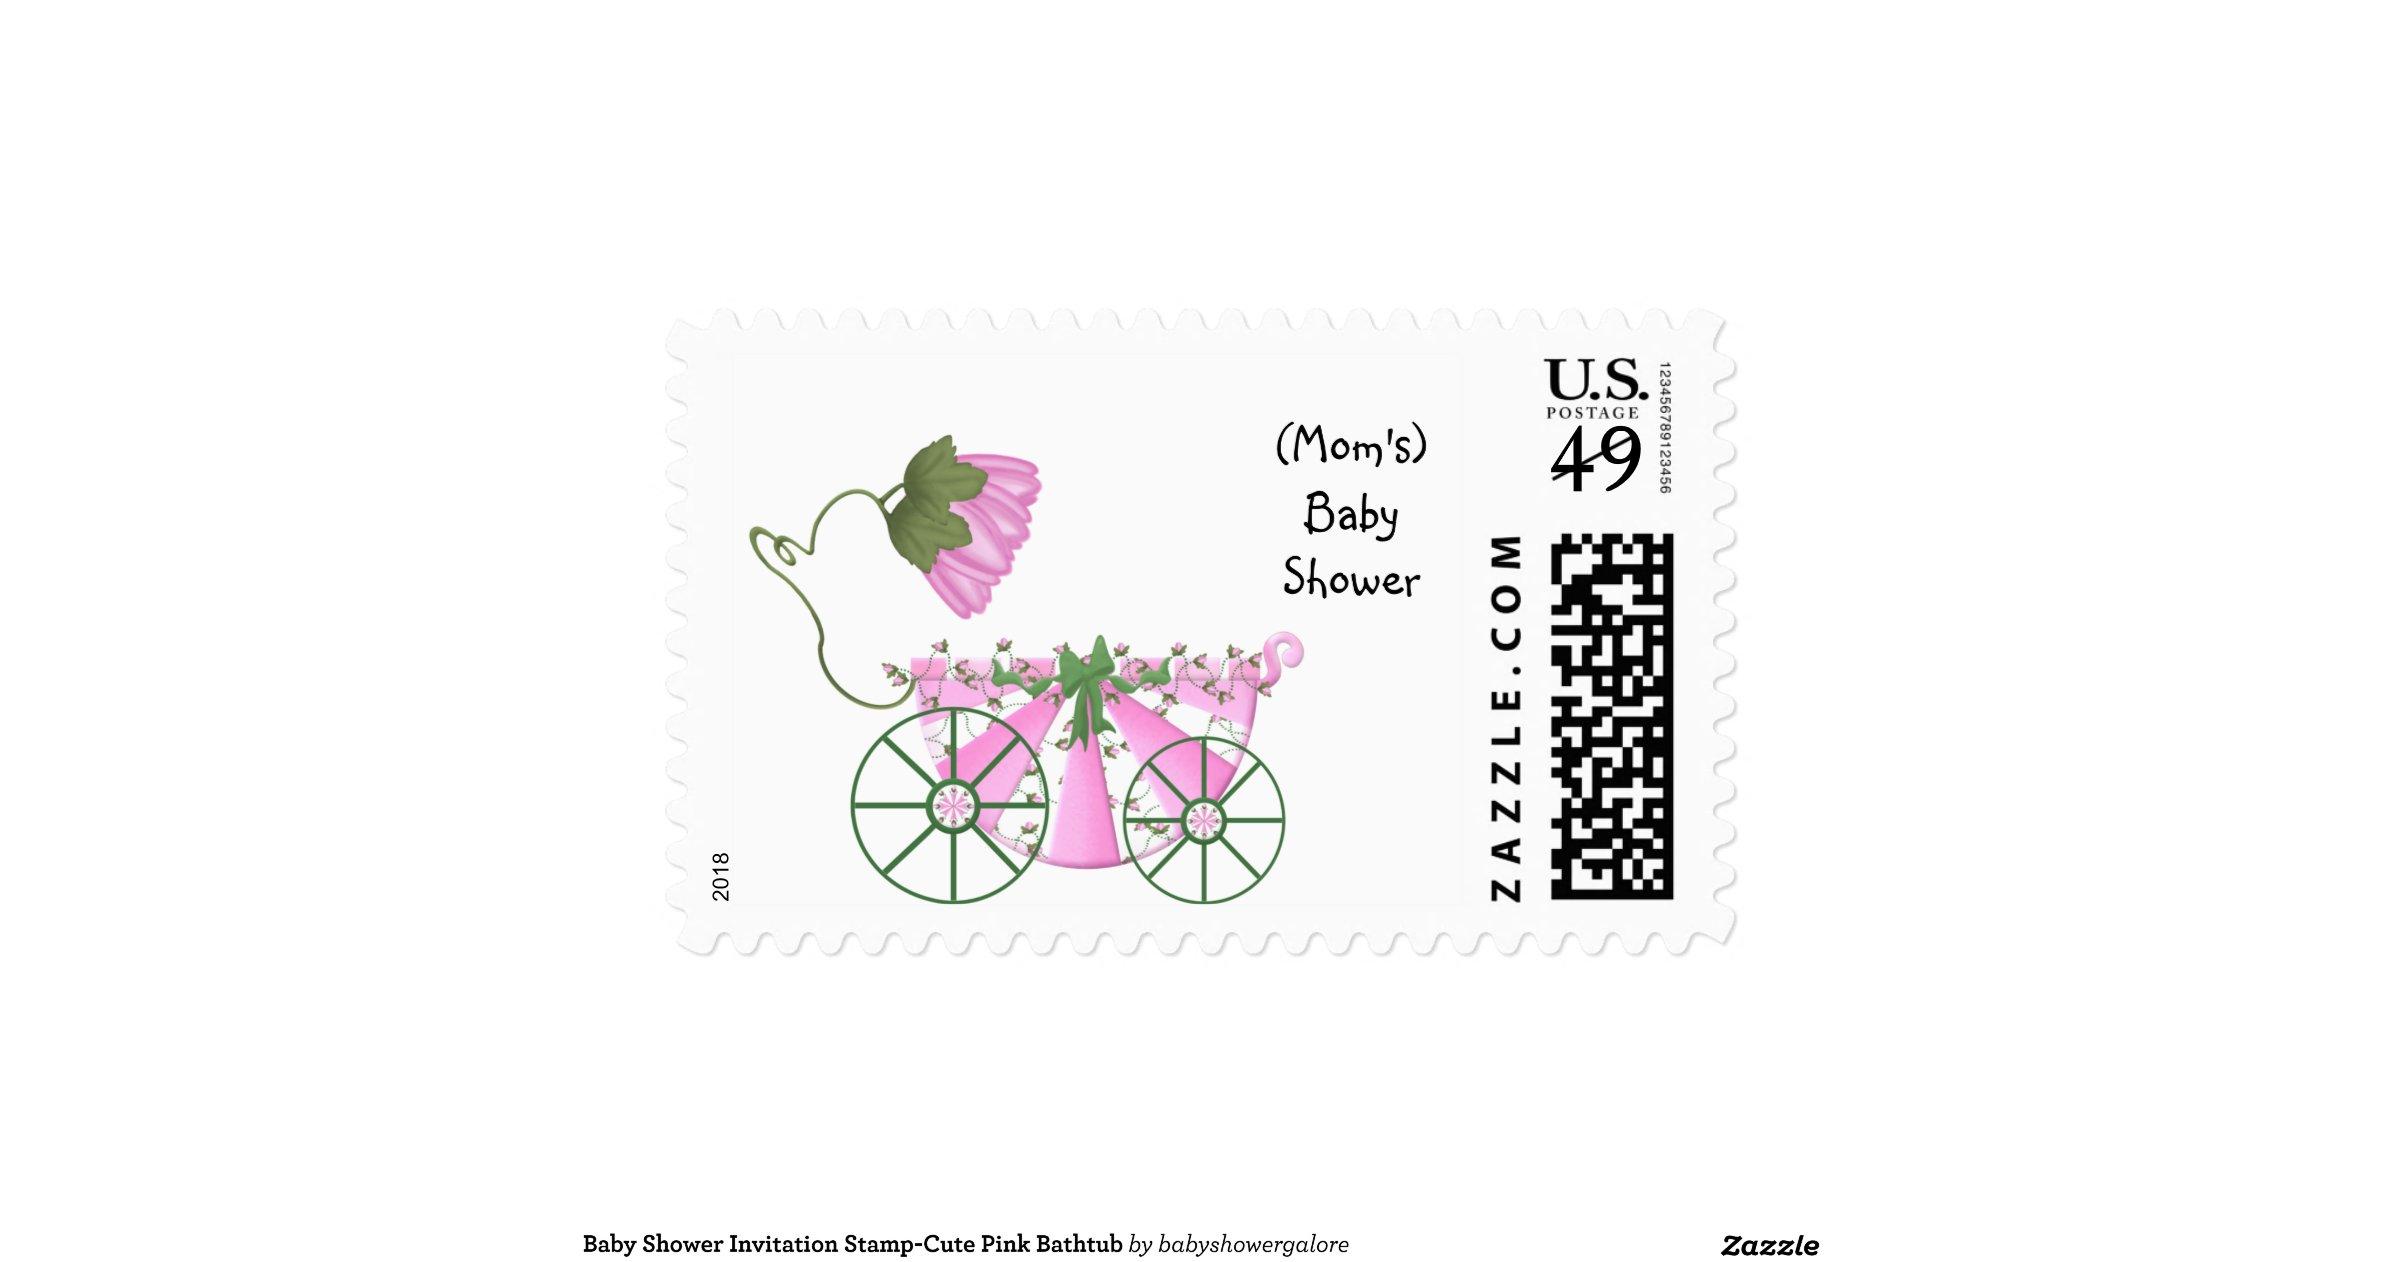 baby shower invitation stamp cute pink bathtub postage stamps